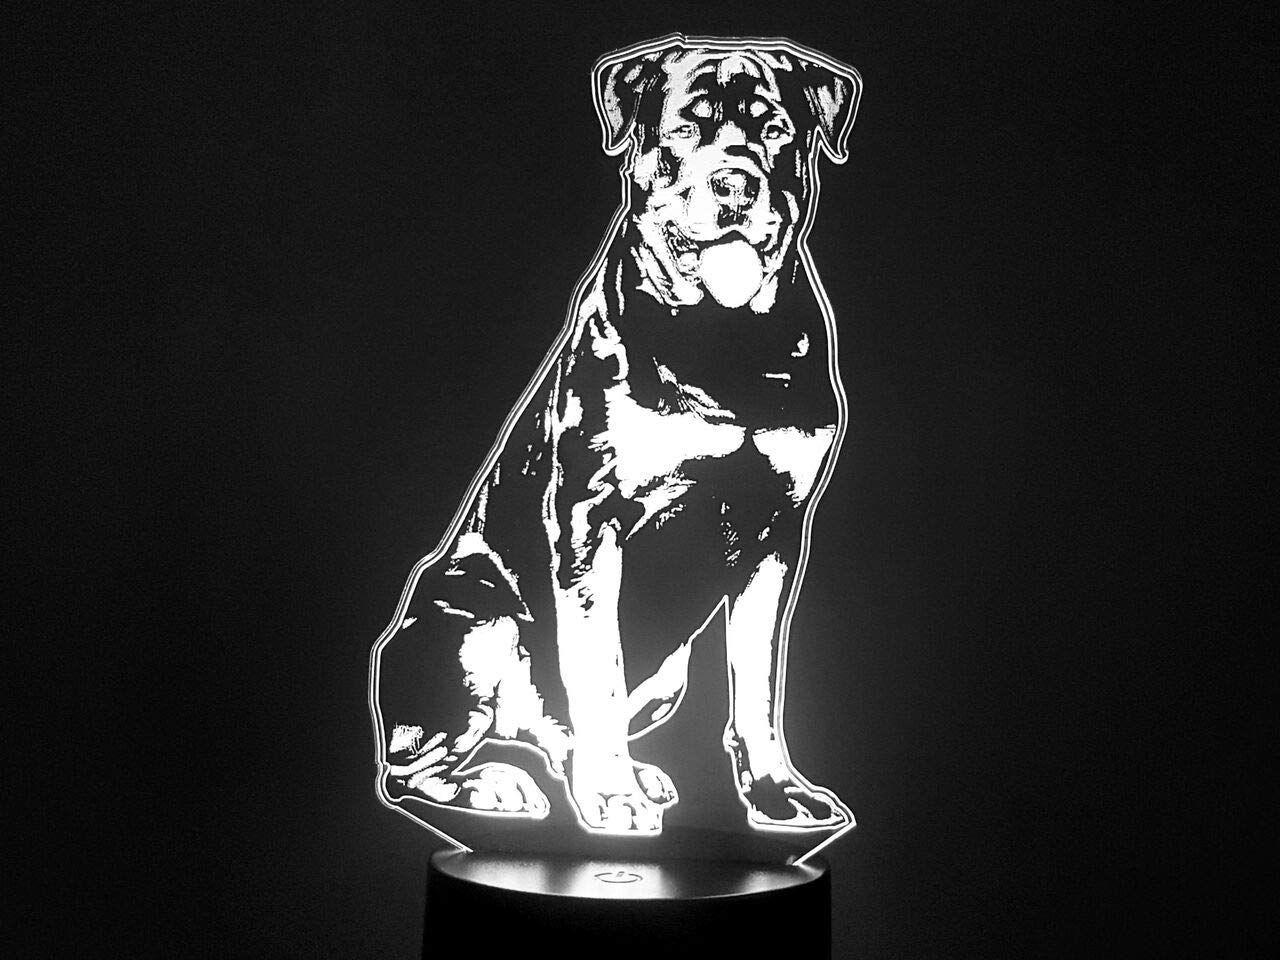 Rottweiler 3d Lampe Led Rottweiler Lampe Led Interieur